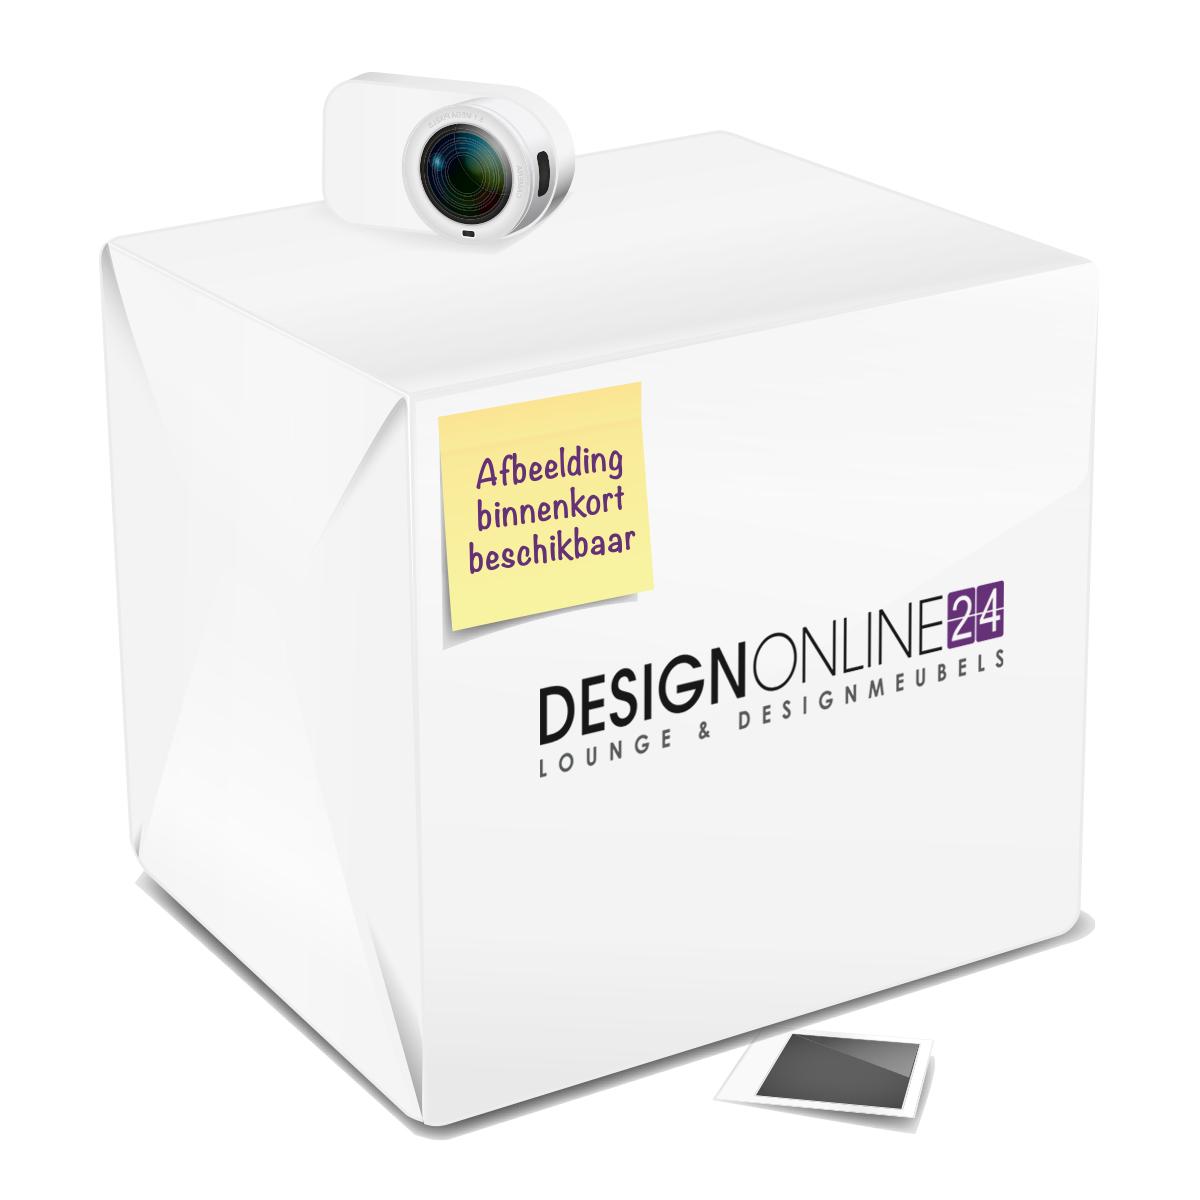 Zuiver tripod koper   wit vloerlamp   designonline24